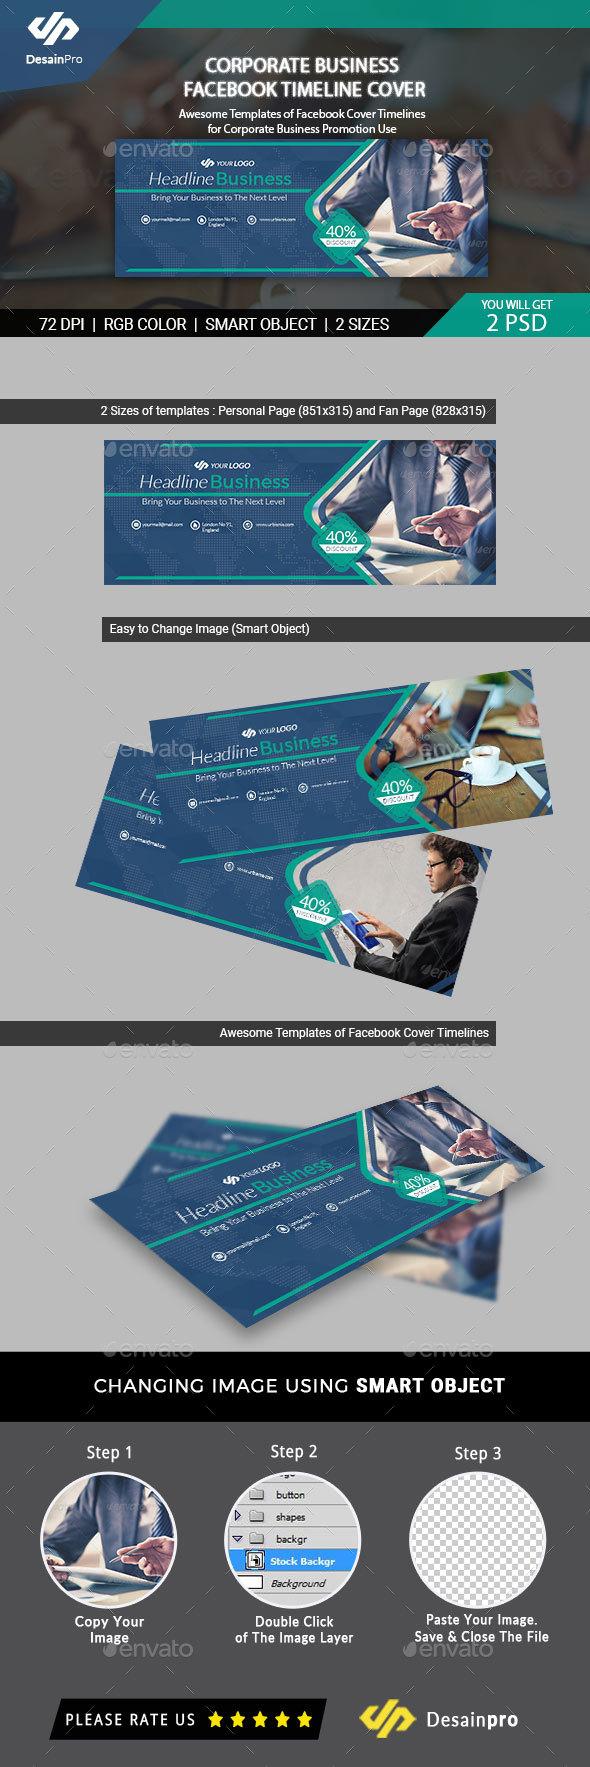 Corporate Business Facebook Timeline Cover - AR - Facebook Timeline Covers Social Media